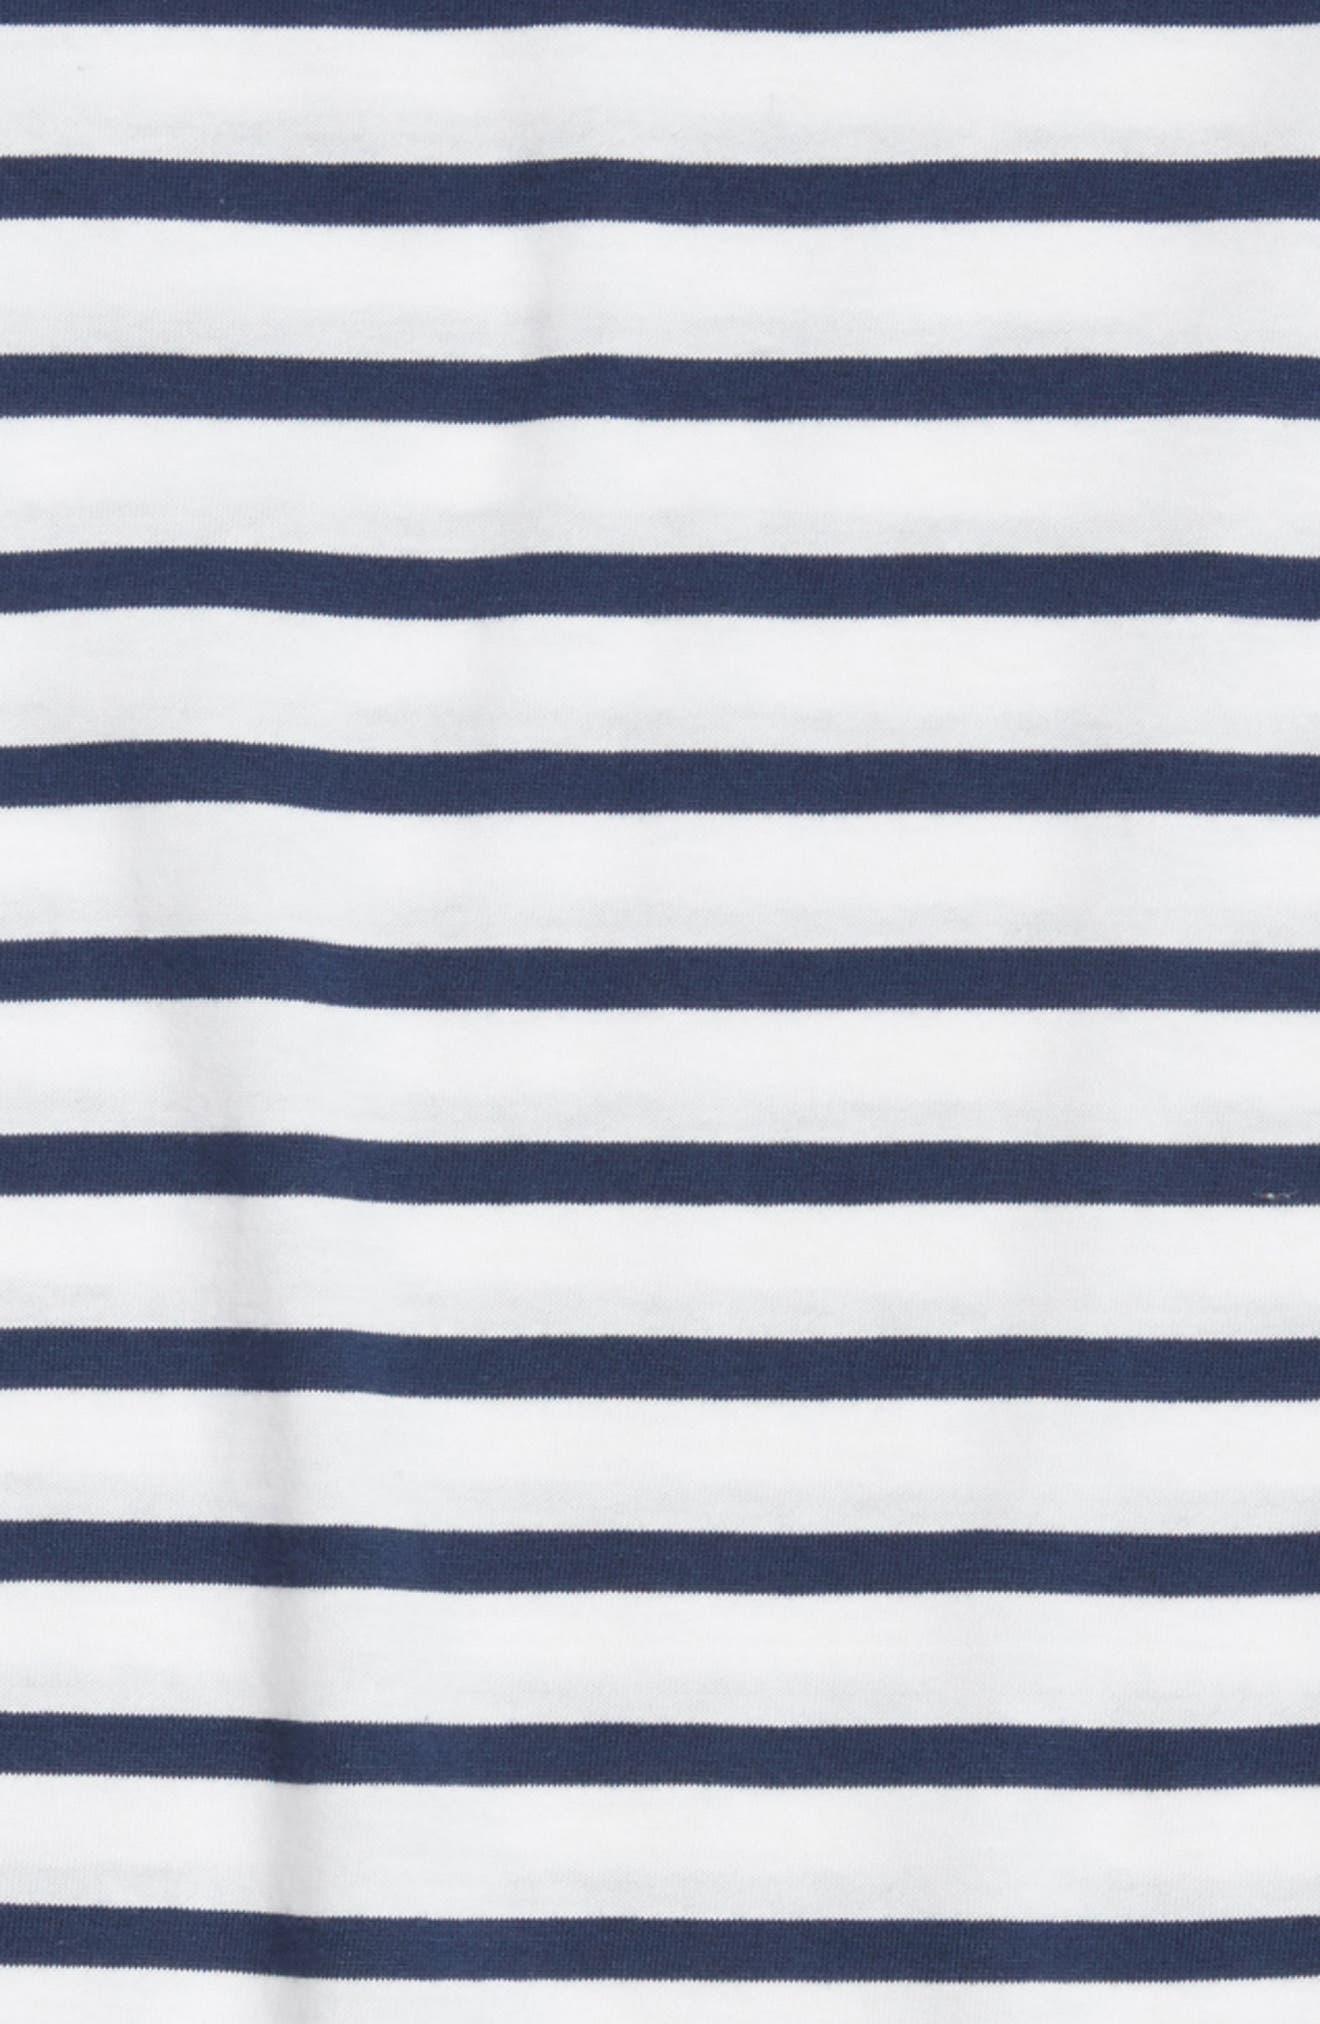 Alternate Image 2  - Saint James Minquiers Kids Striped Sailor Shirt (Toddlers, Little Kids & Big Kids)